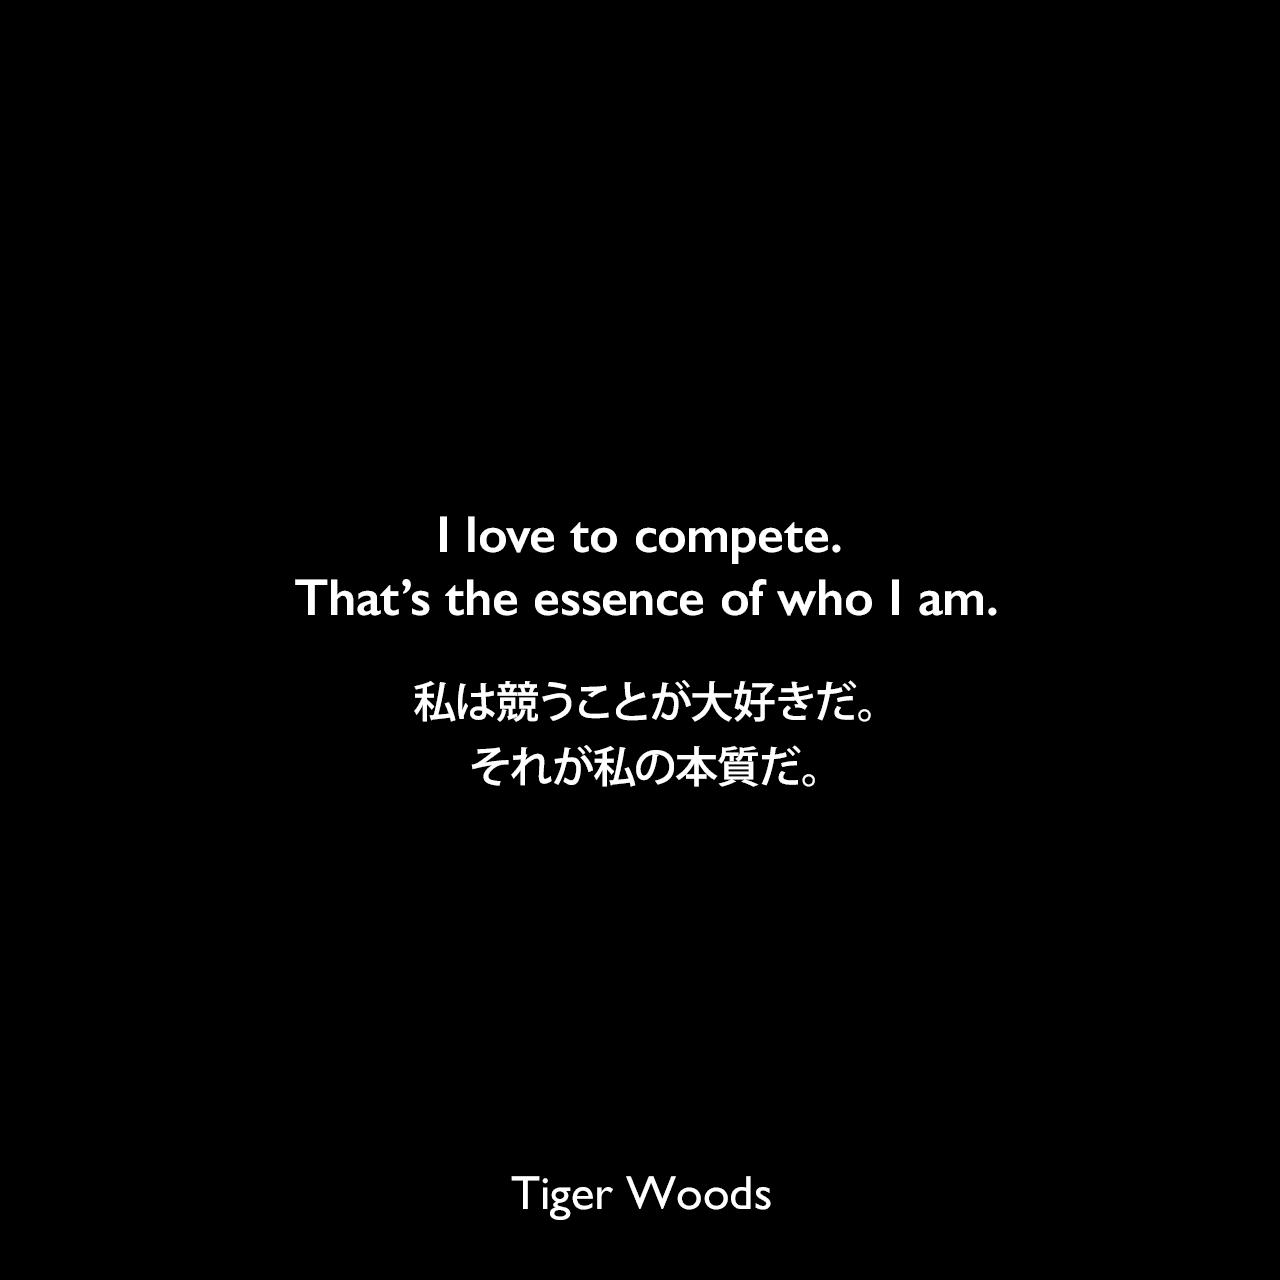 I love to compete. That's the essence of who I am.私は競うことが大好きだ。それが私の本質だ。- 2006年 CBNnews.comよりTiger Woods